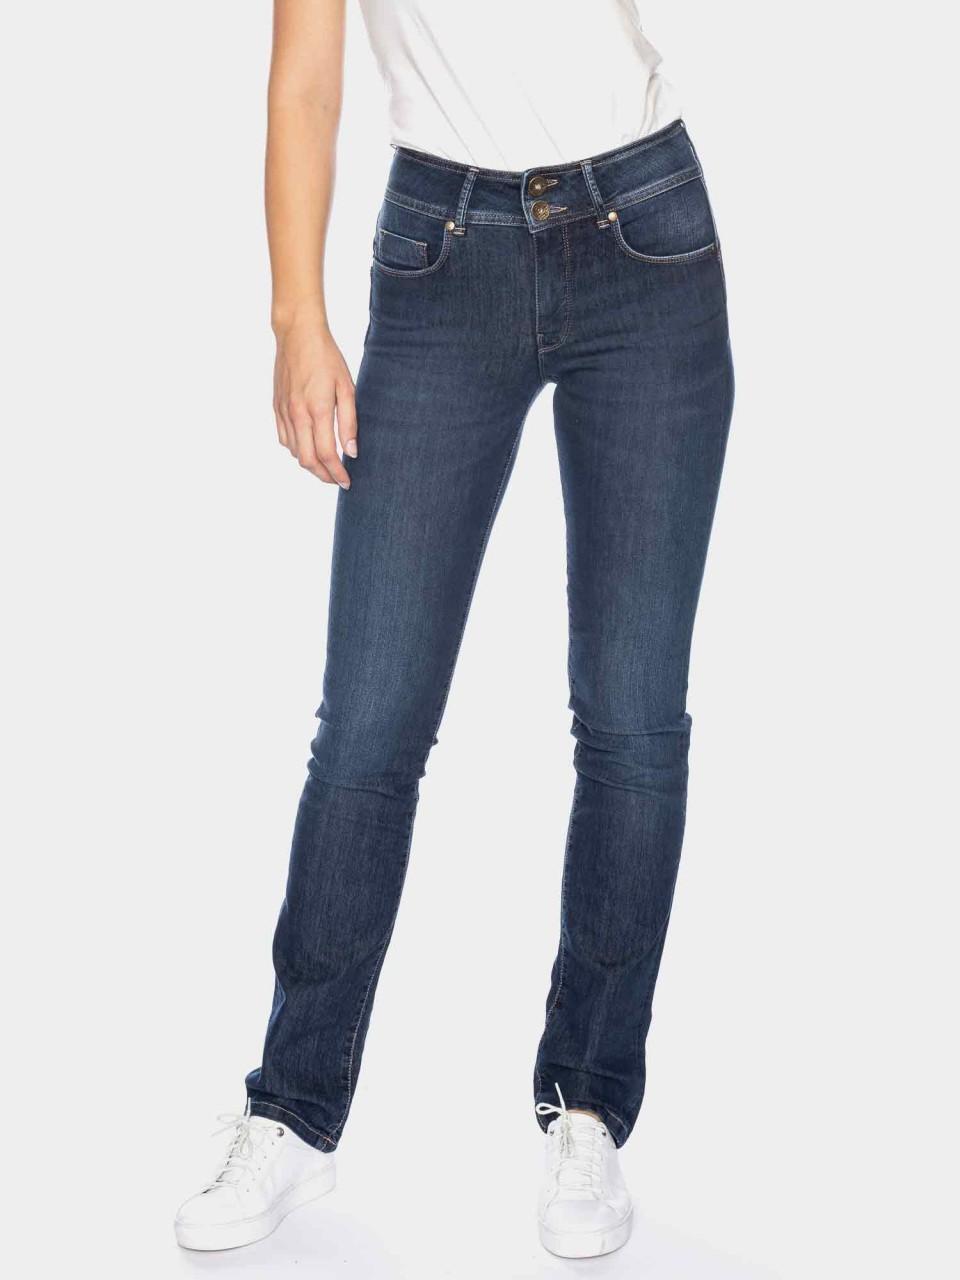 Jeans Jackie 05753 BL USD